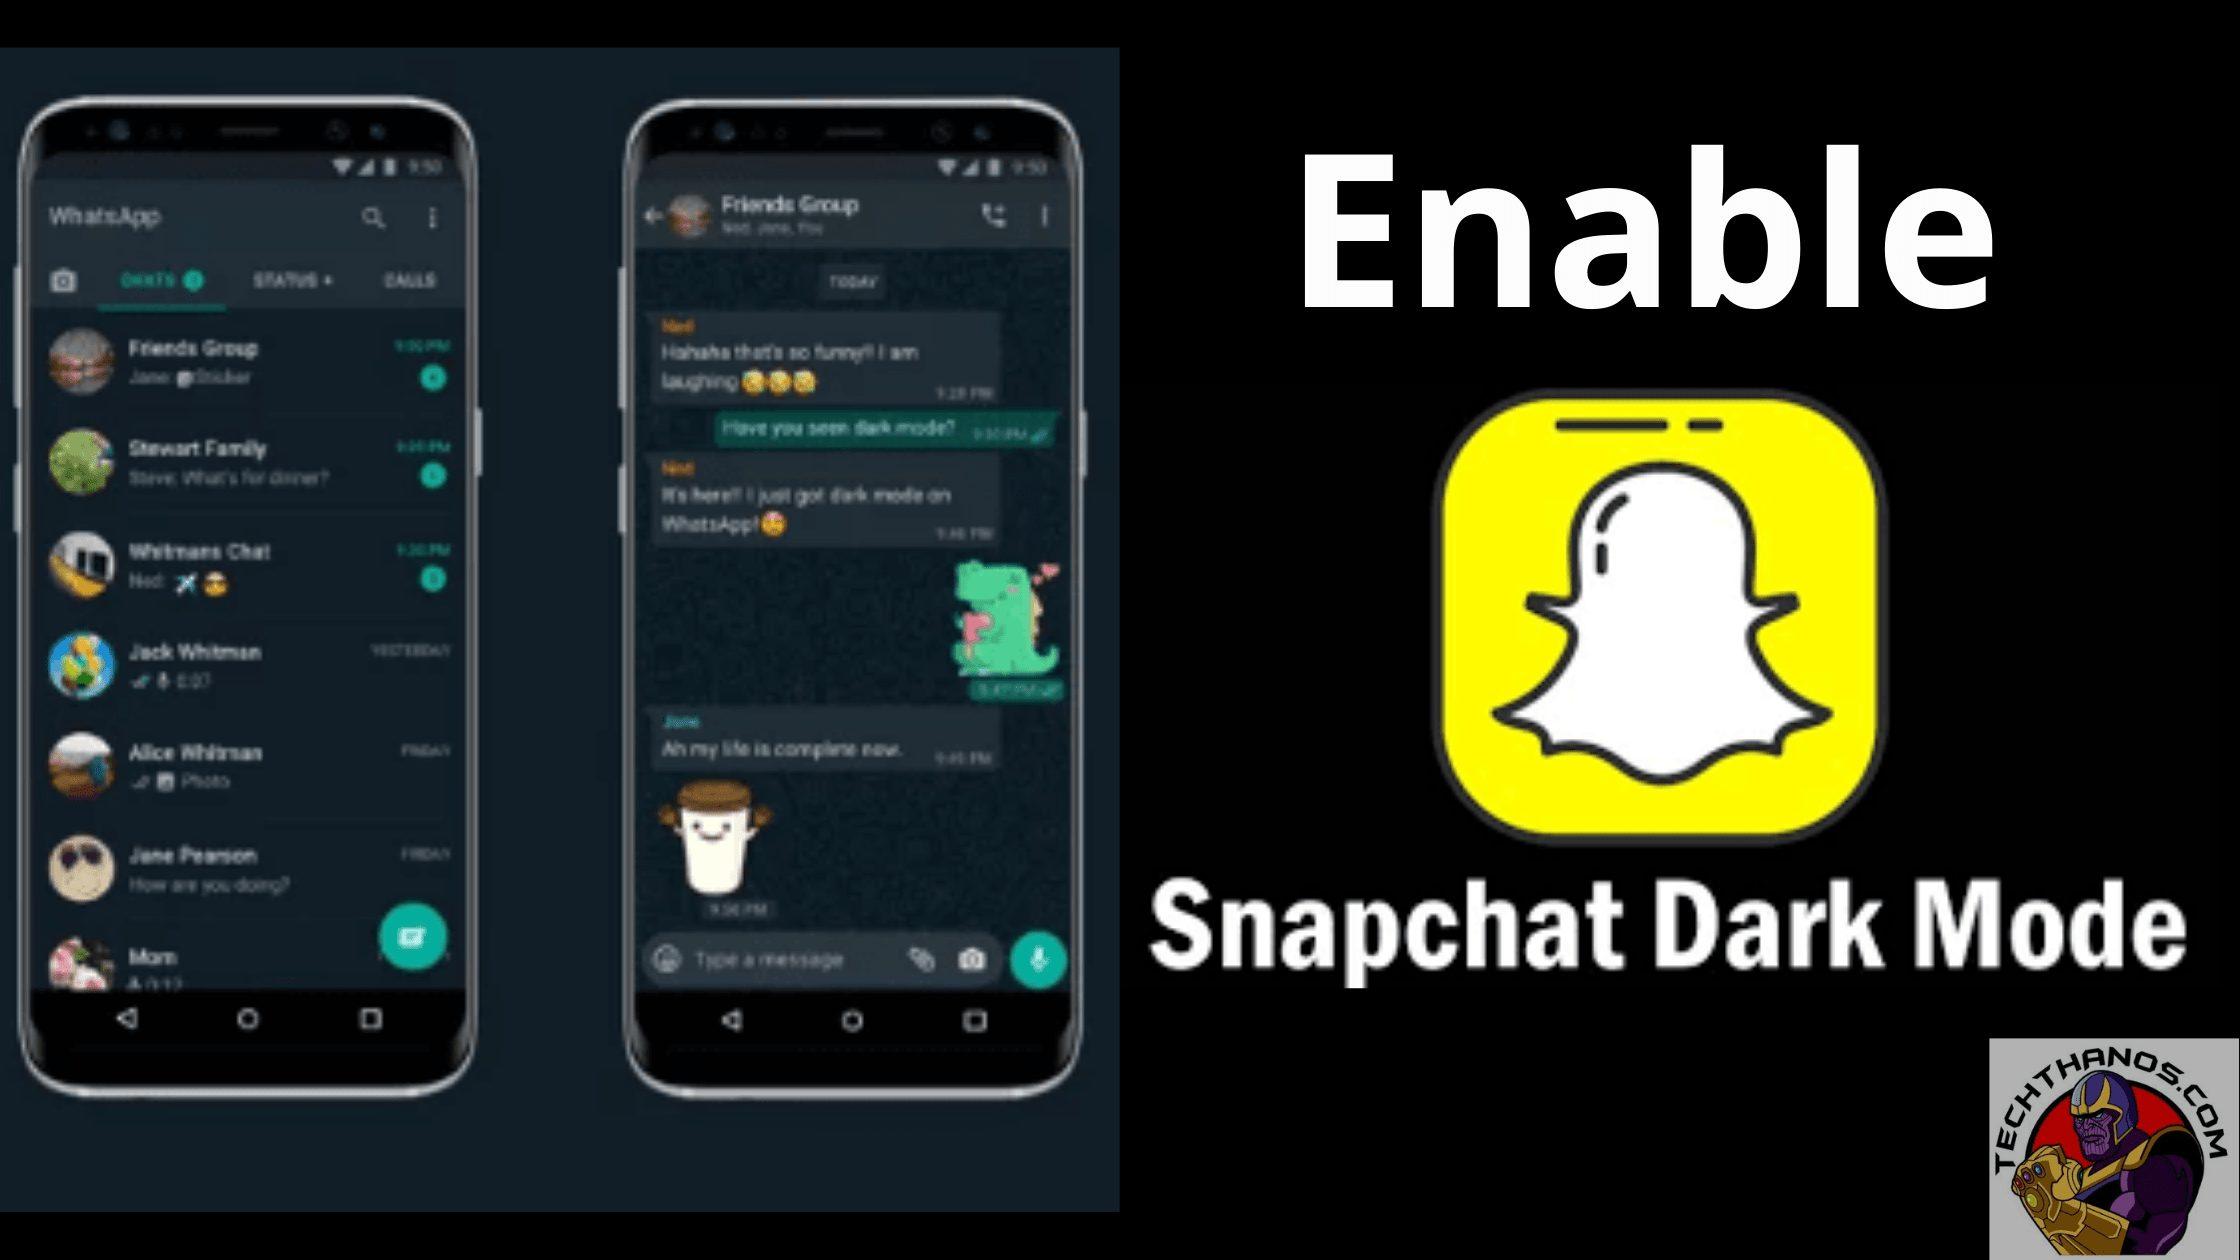 Enable Dark mode snapchat